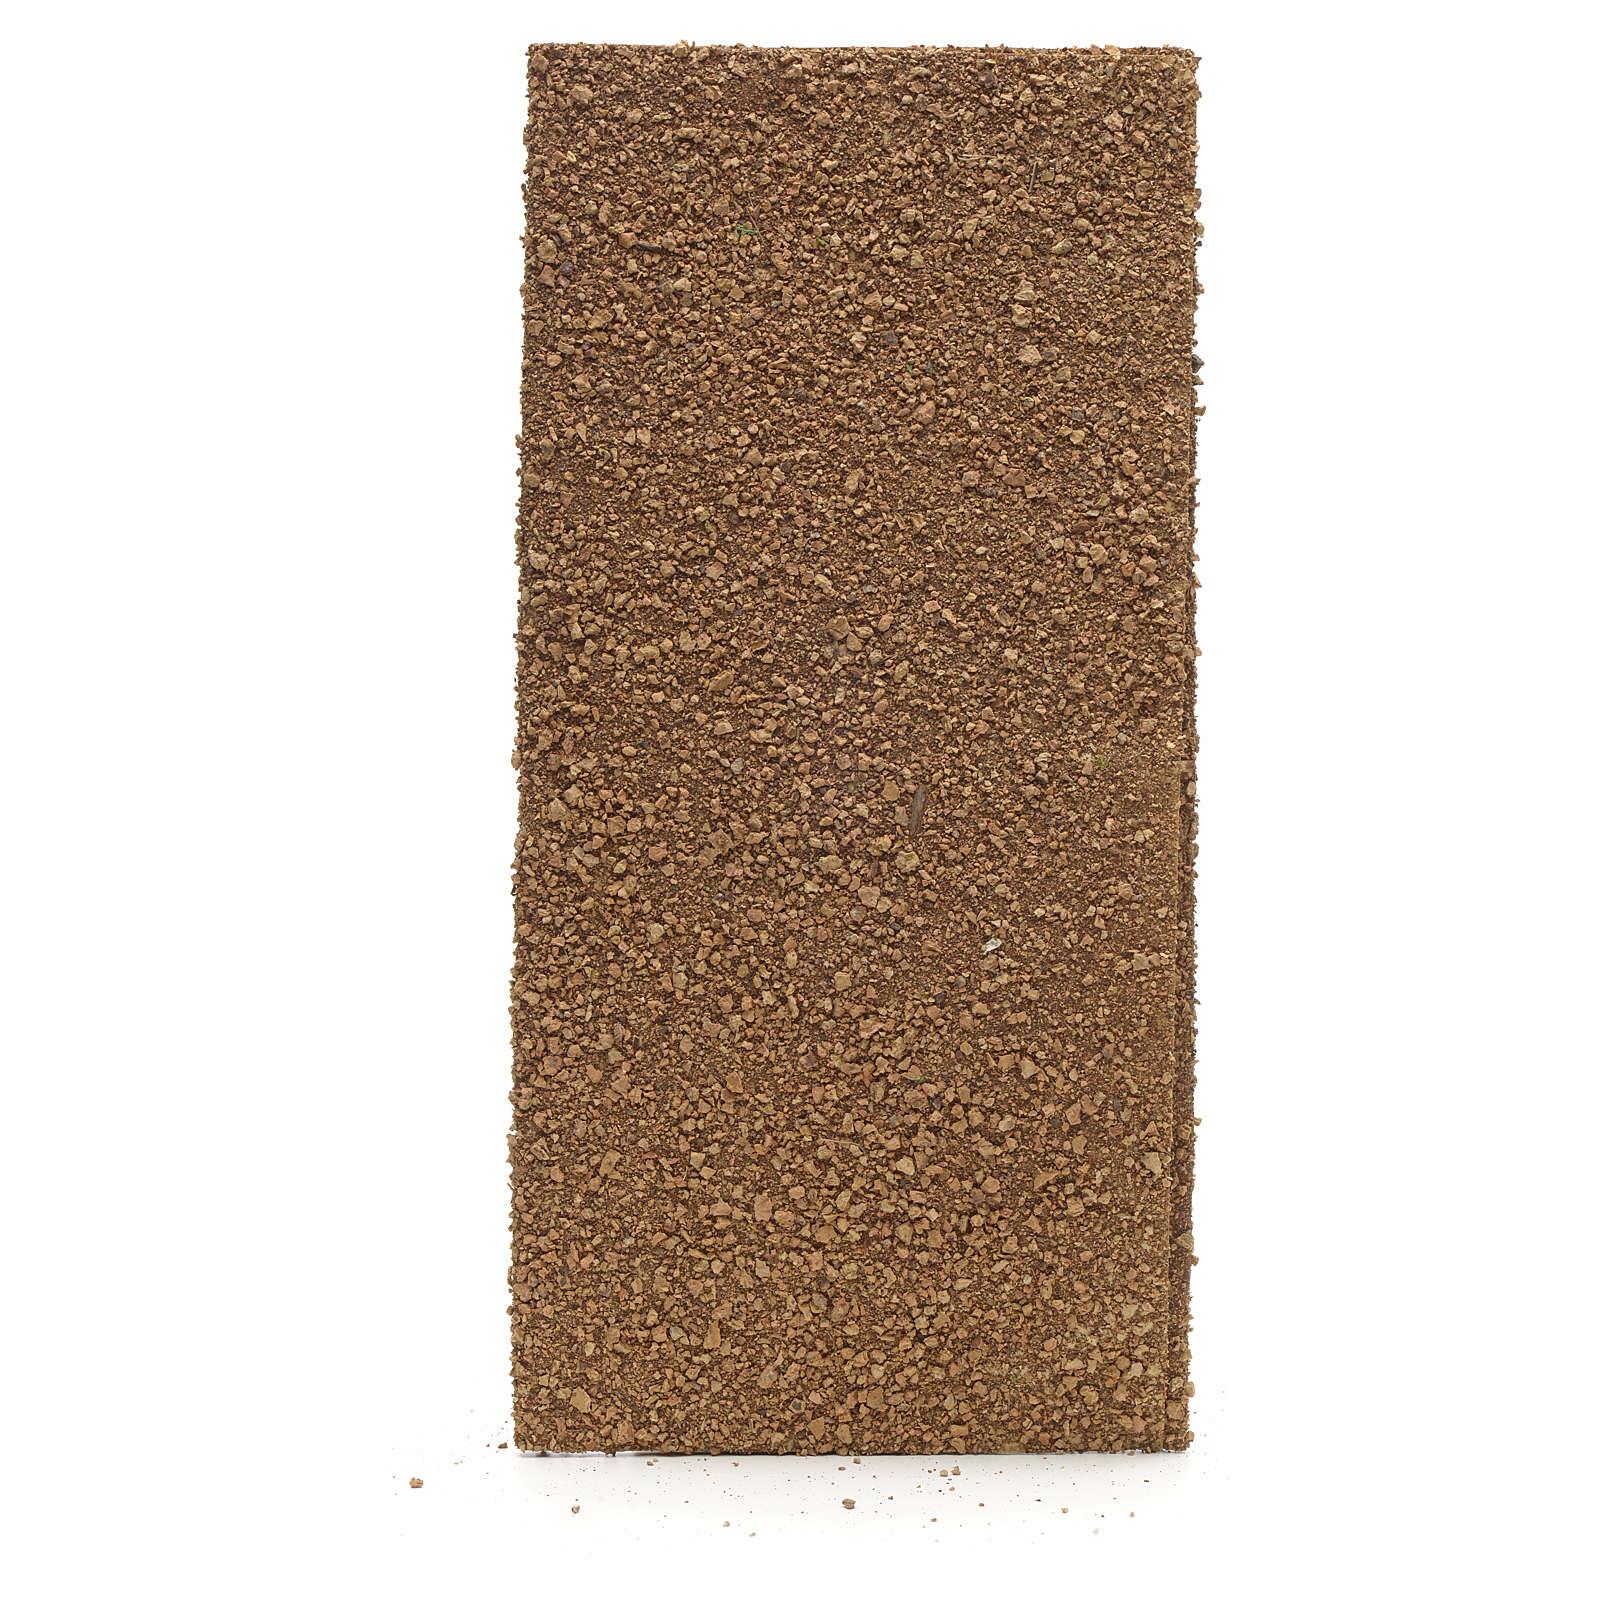 Nativity backdrop, cork paper roll 70x50cm 4